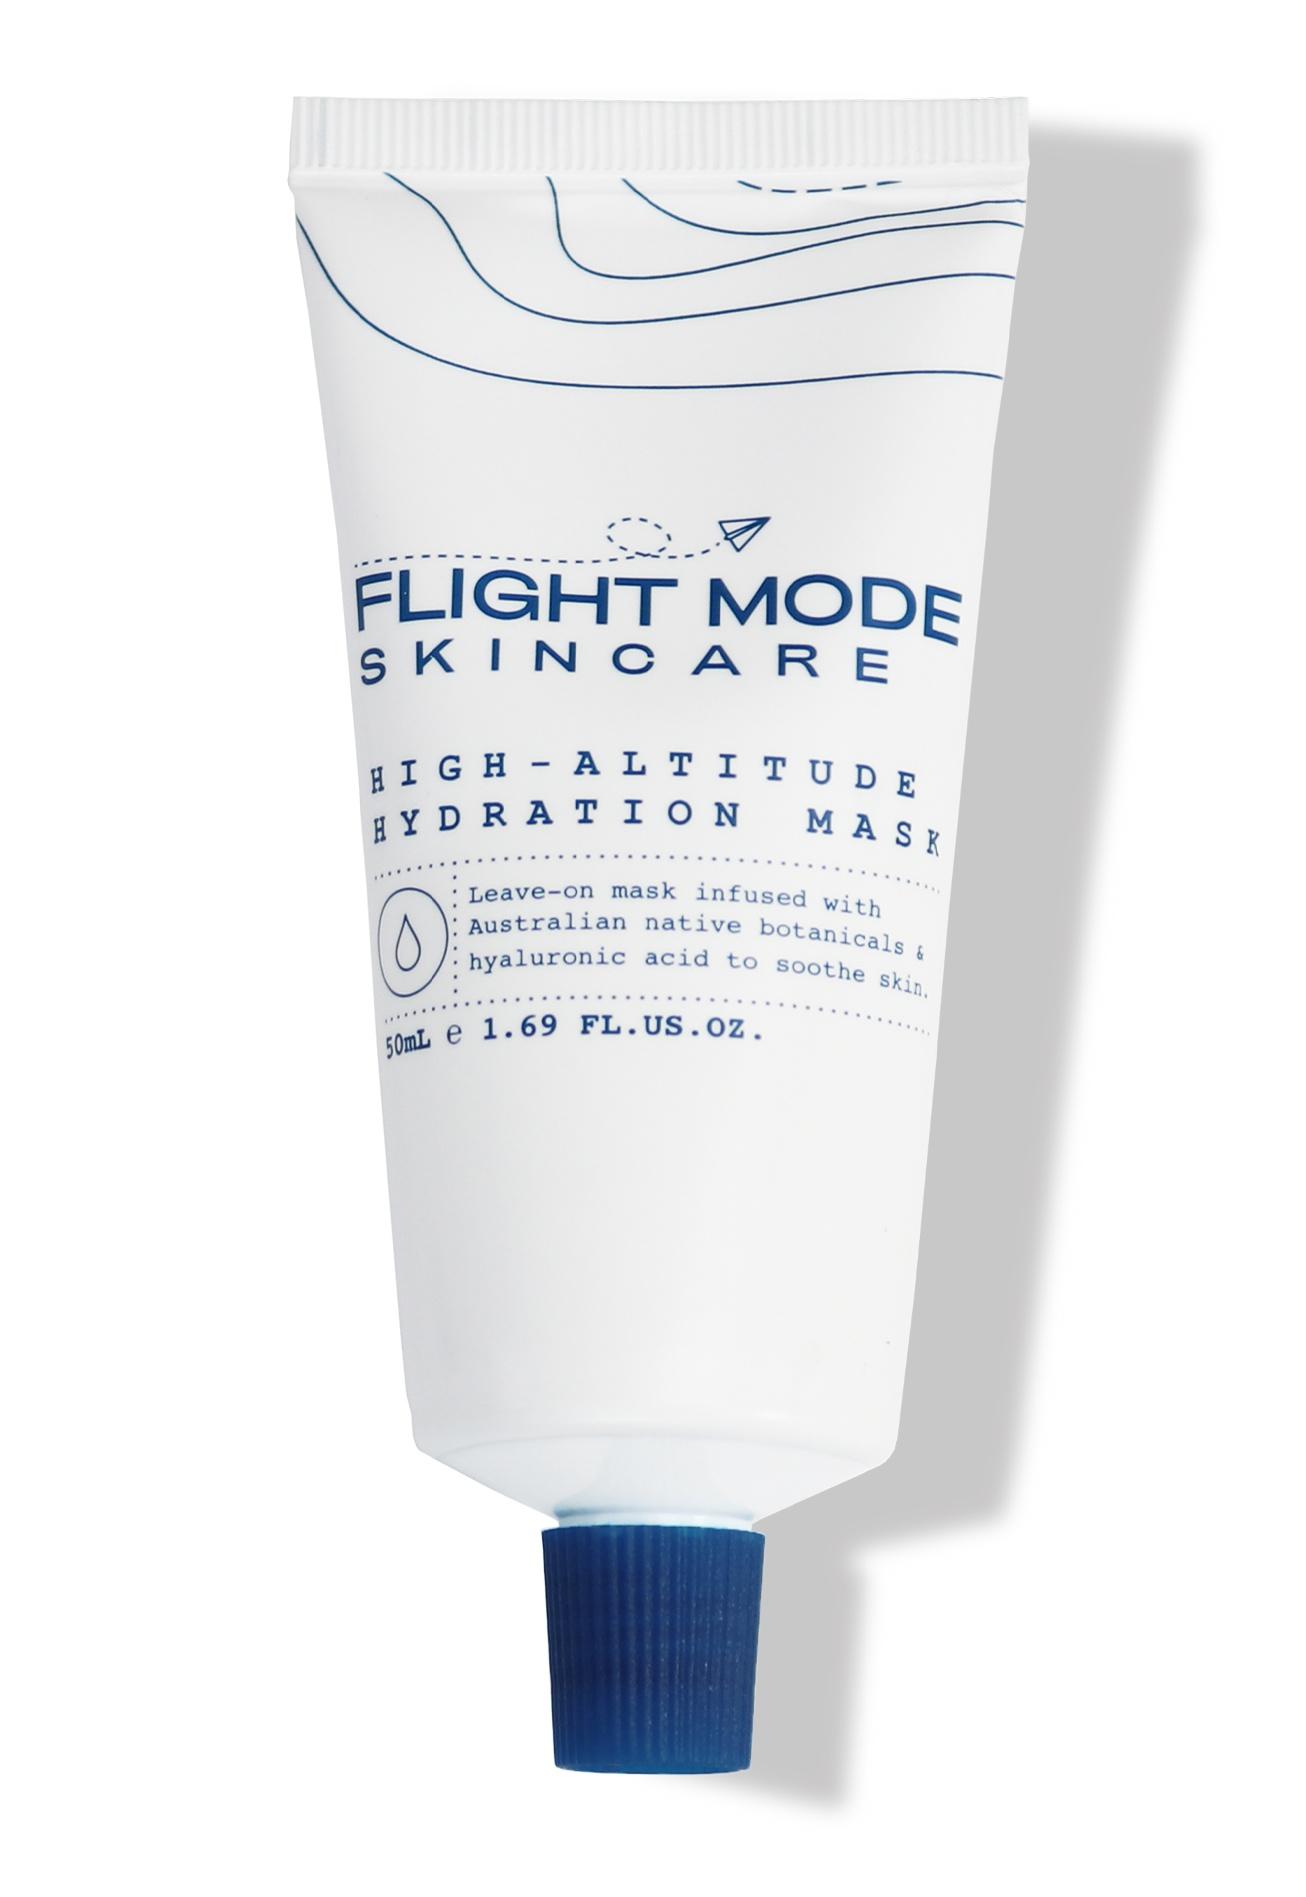 Flight Mode Skincare High-Altitude Hydration Mask